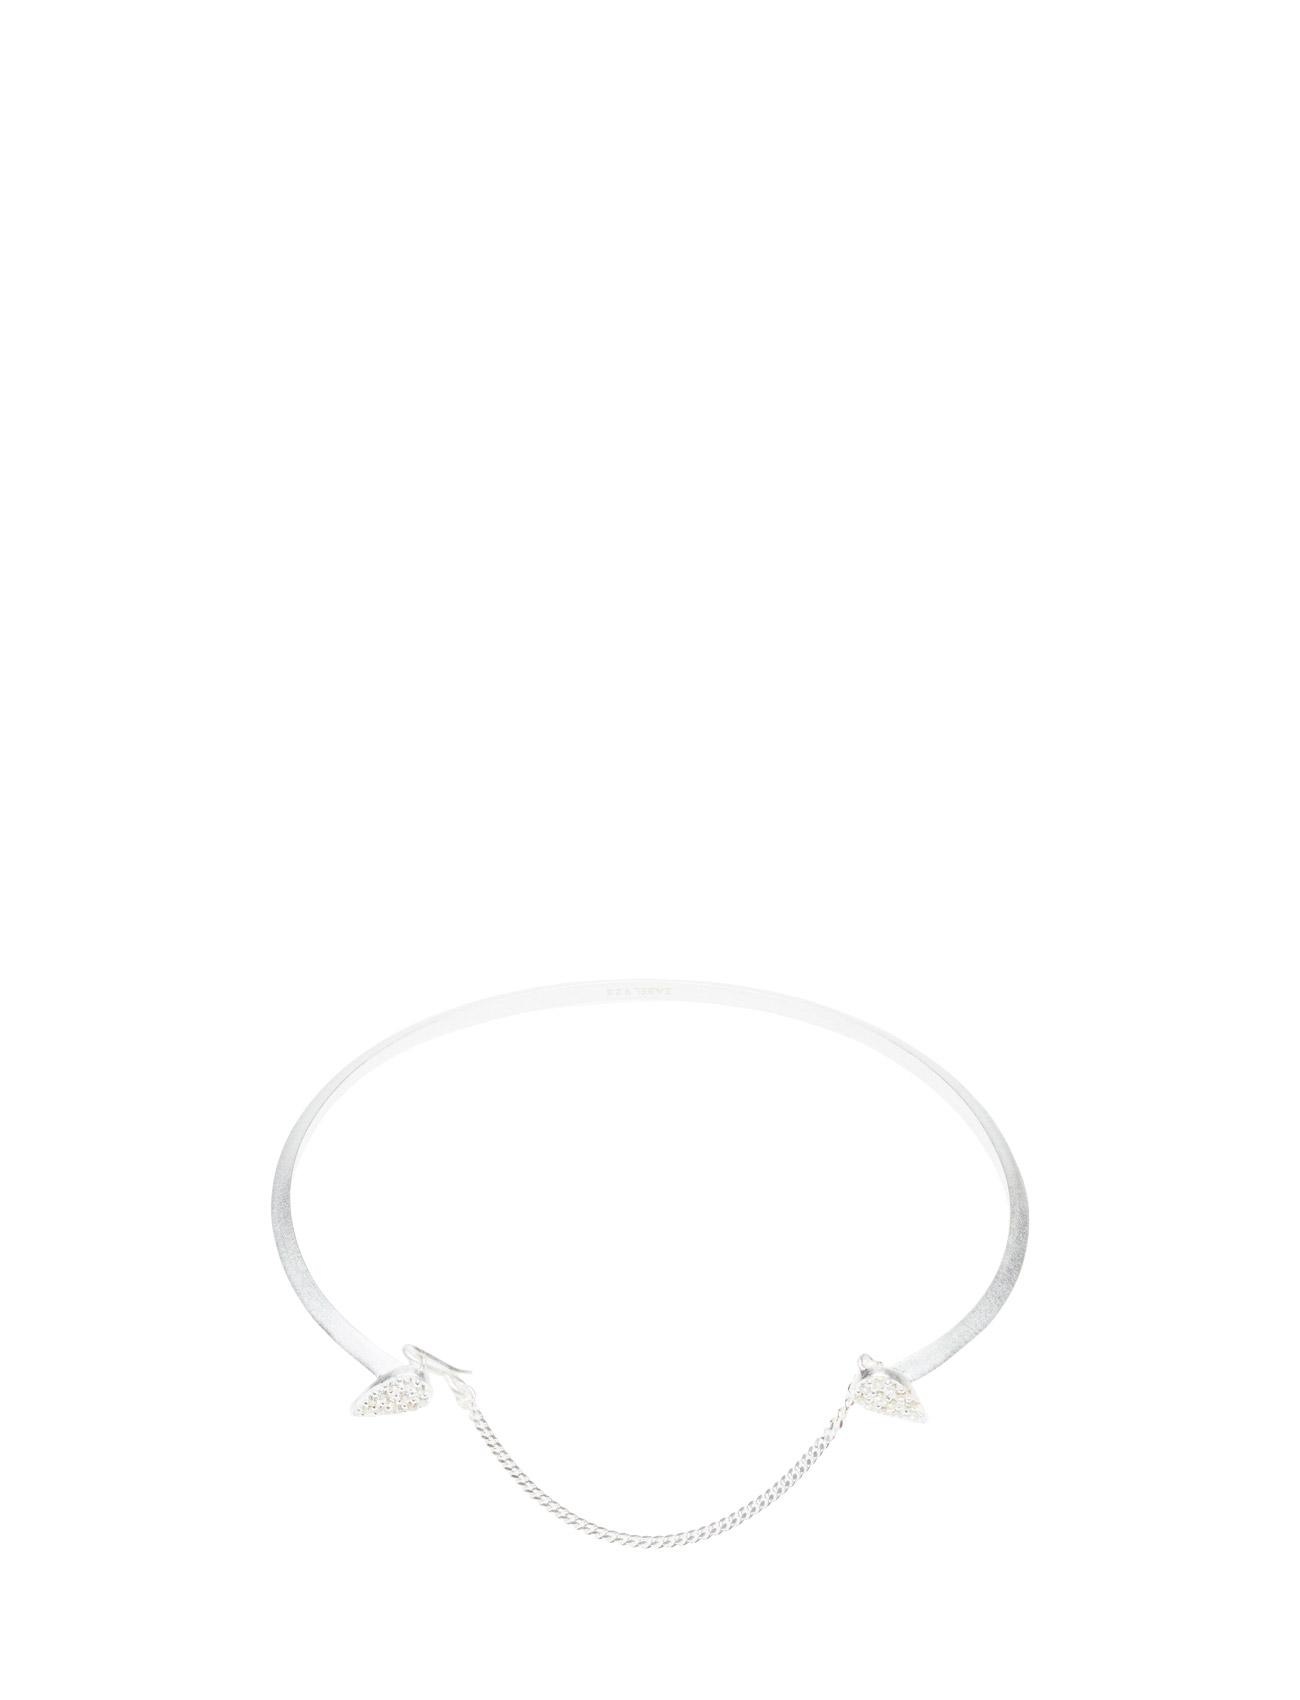 Elie Zabel Jewellery Smykker til Damer i